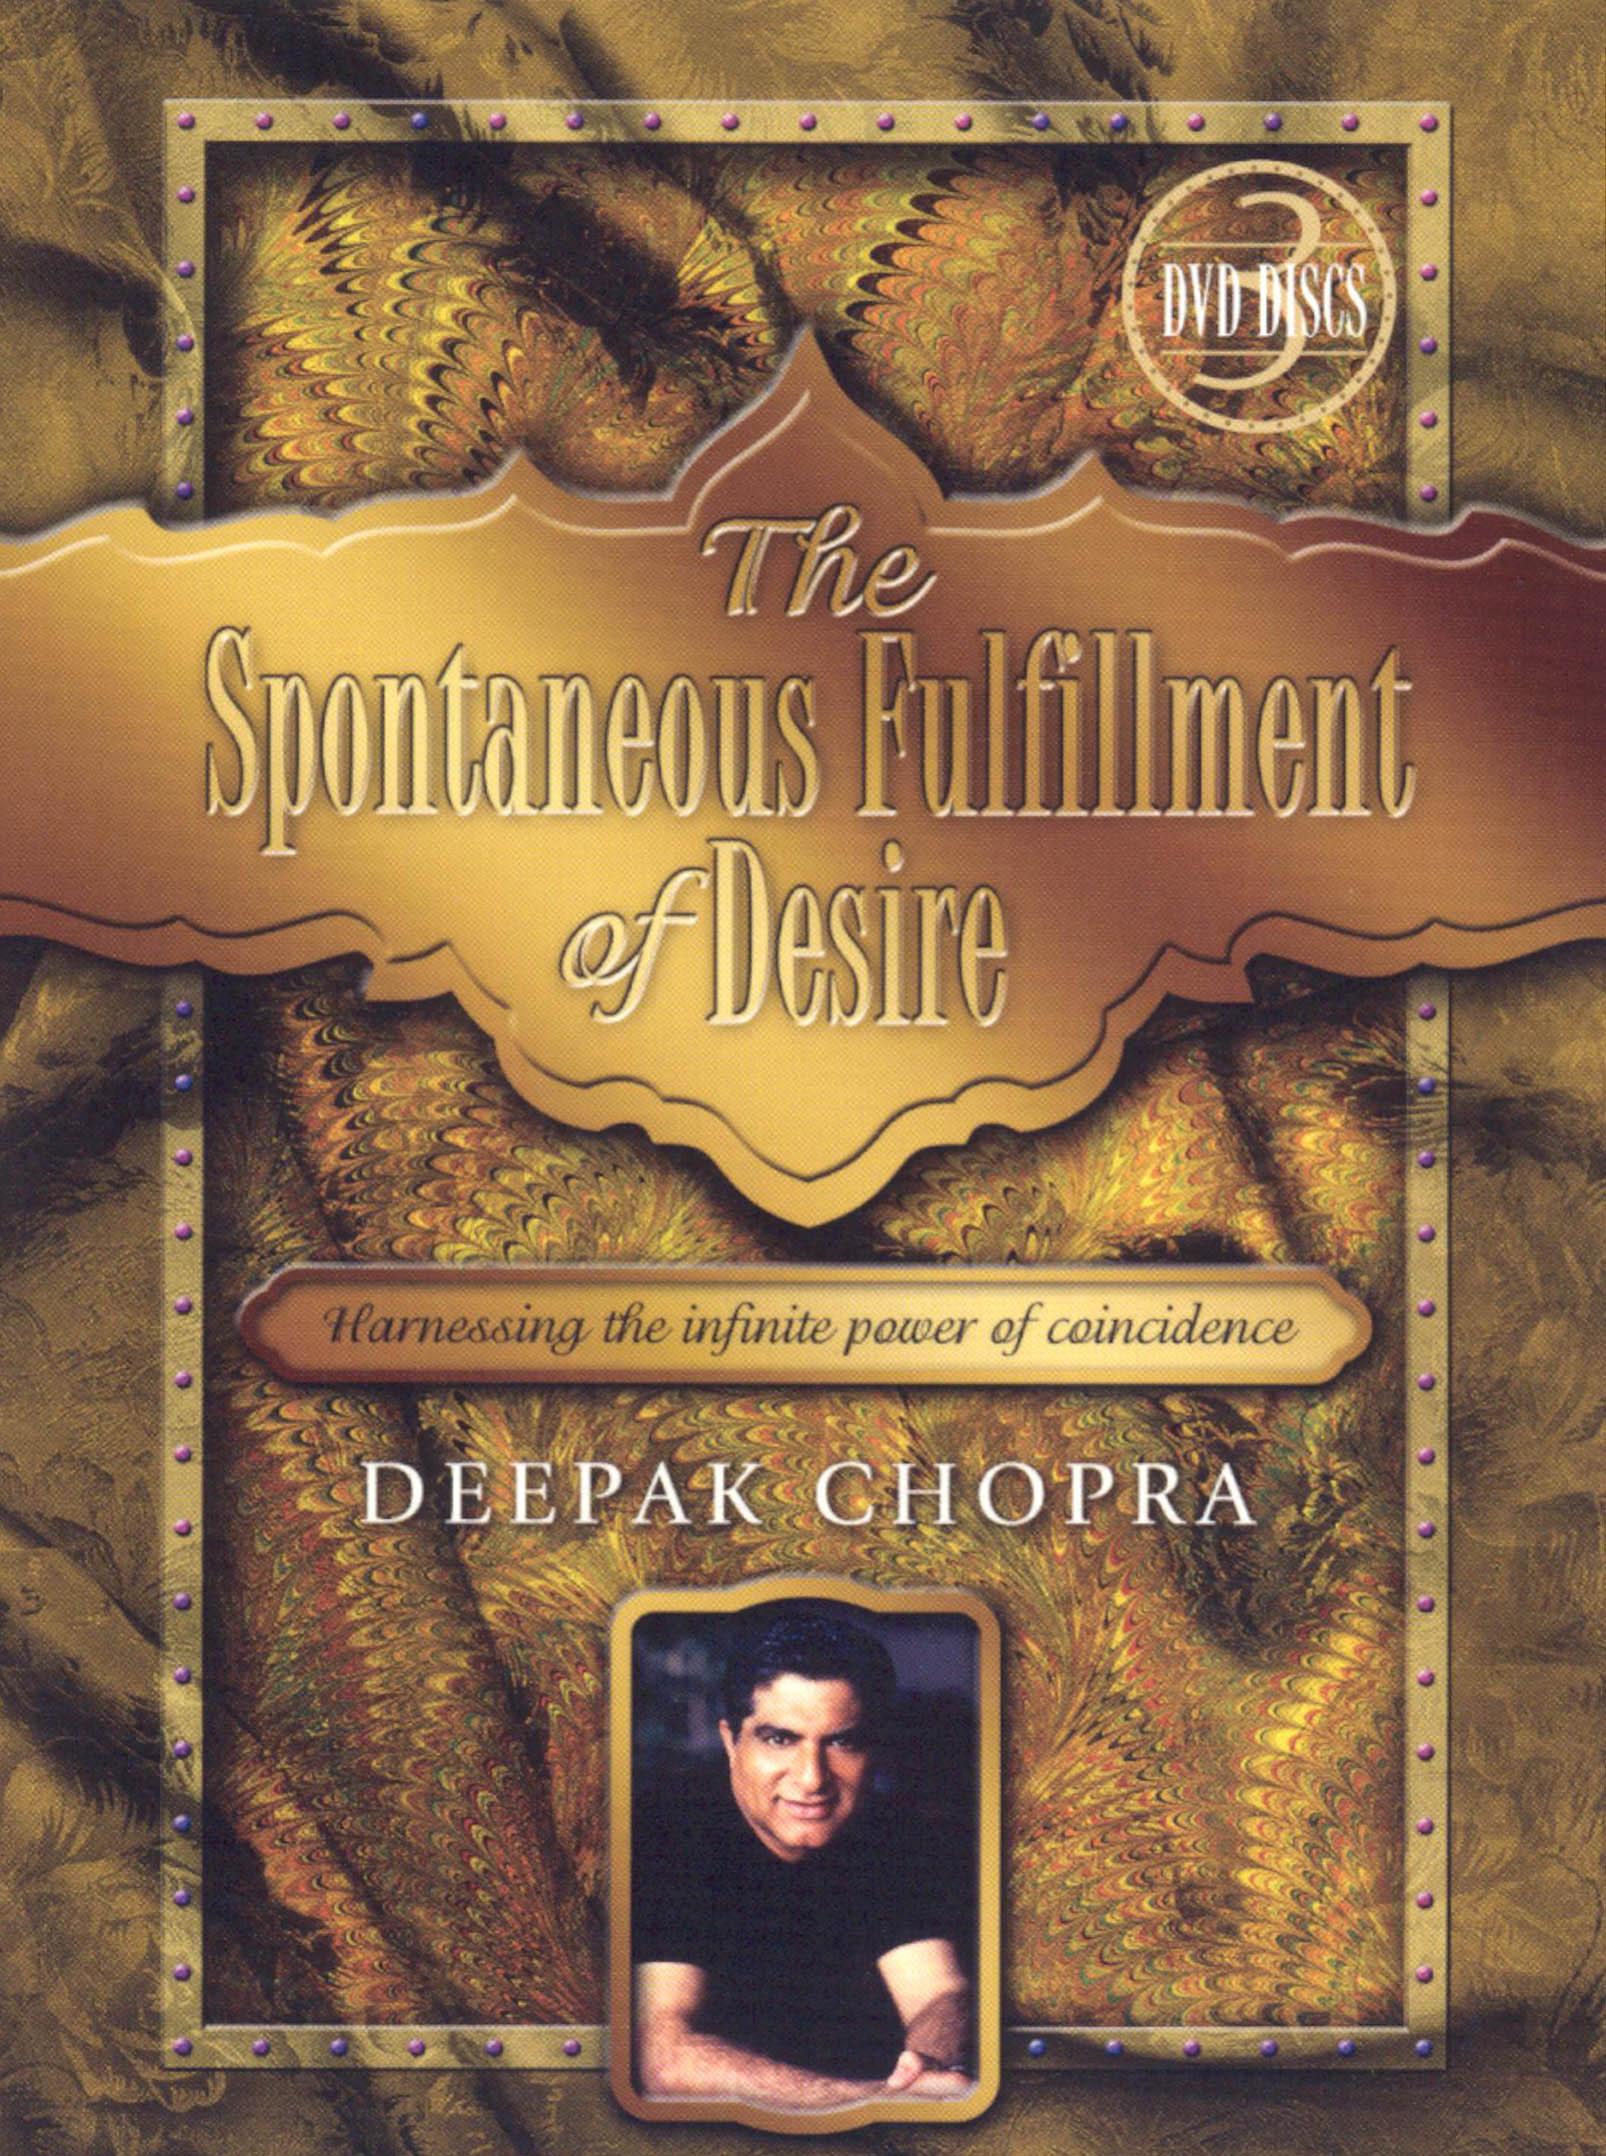 Deepak Chopra: The Spontaneous Fulfillment of Desire